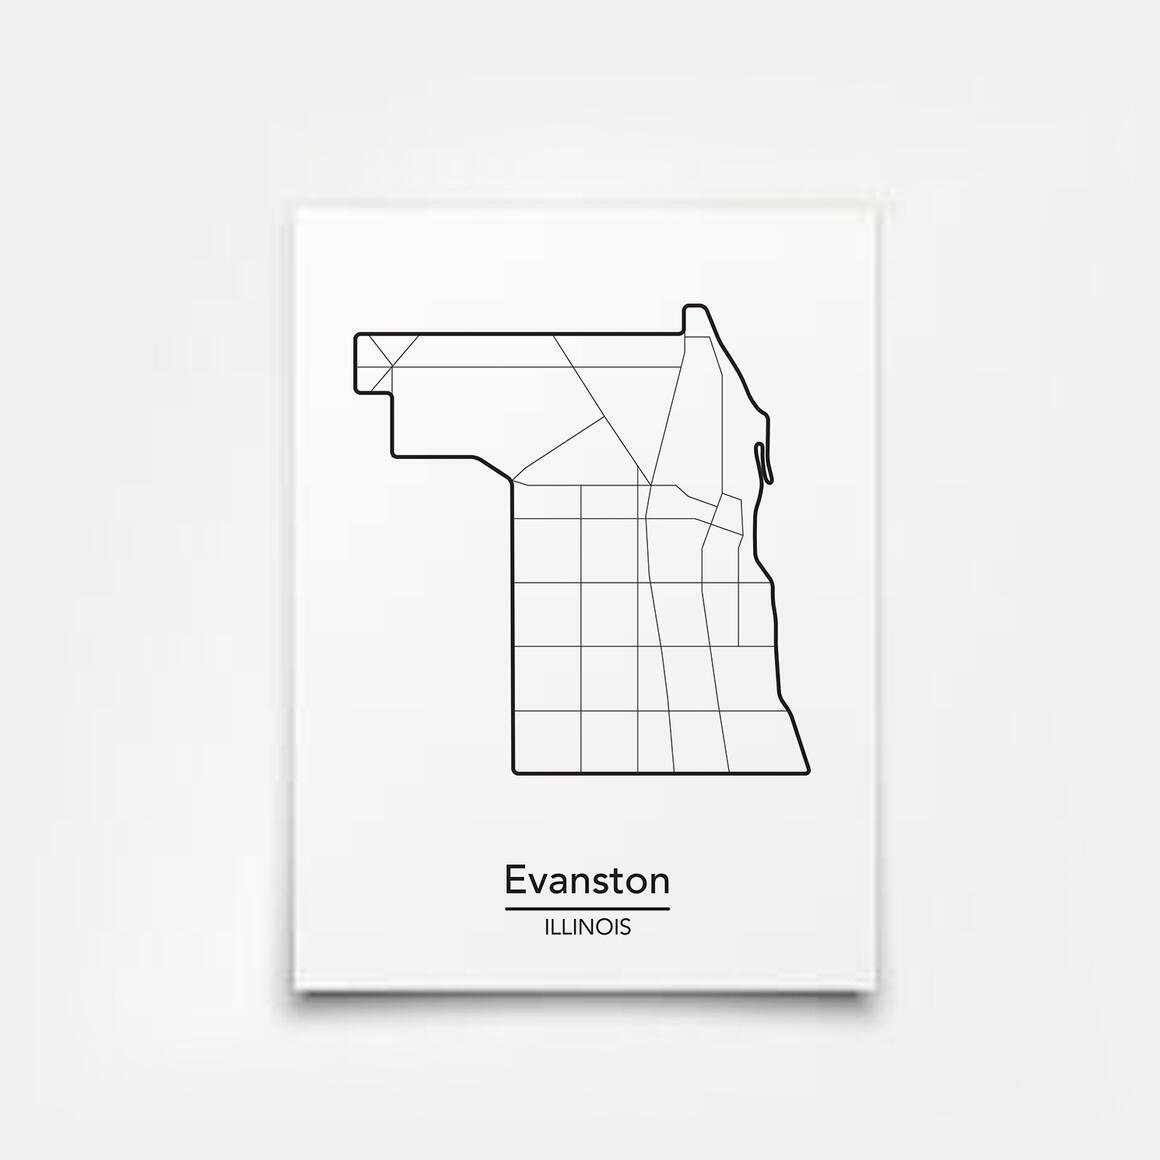 Evanston, Illinois City Map Print   Trada Marketplace